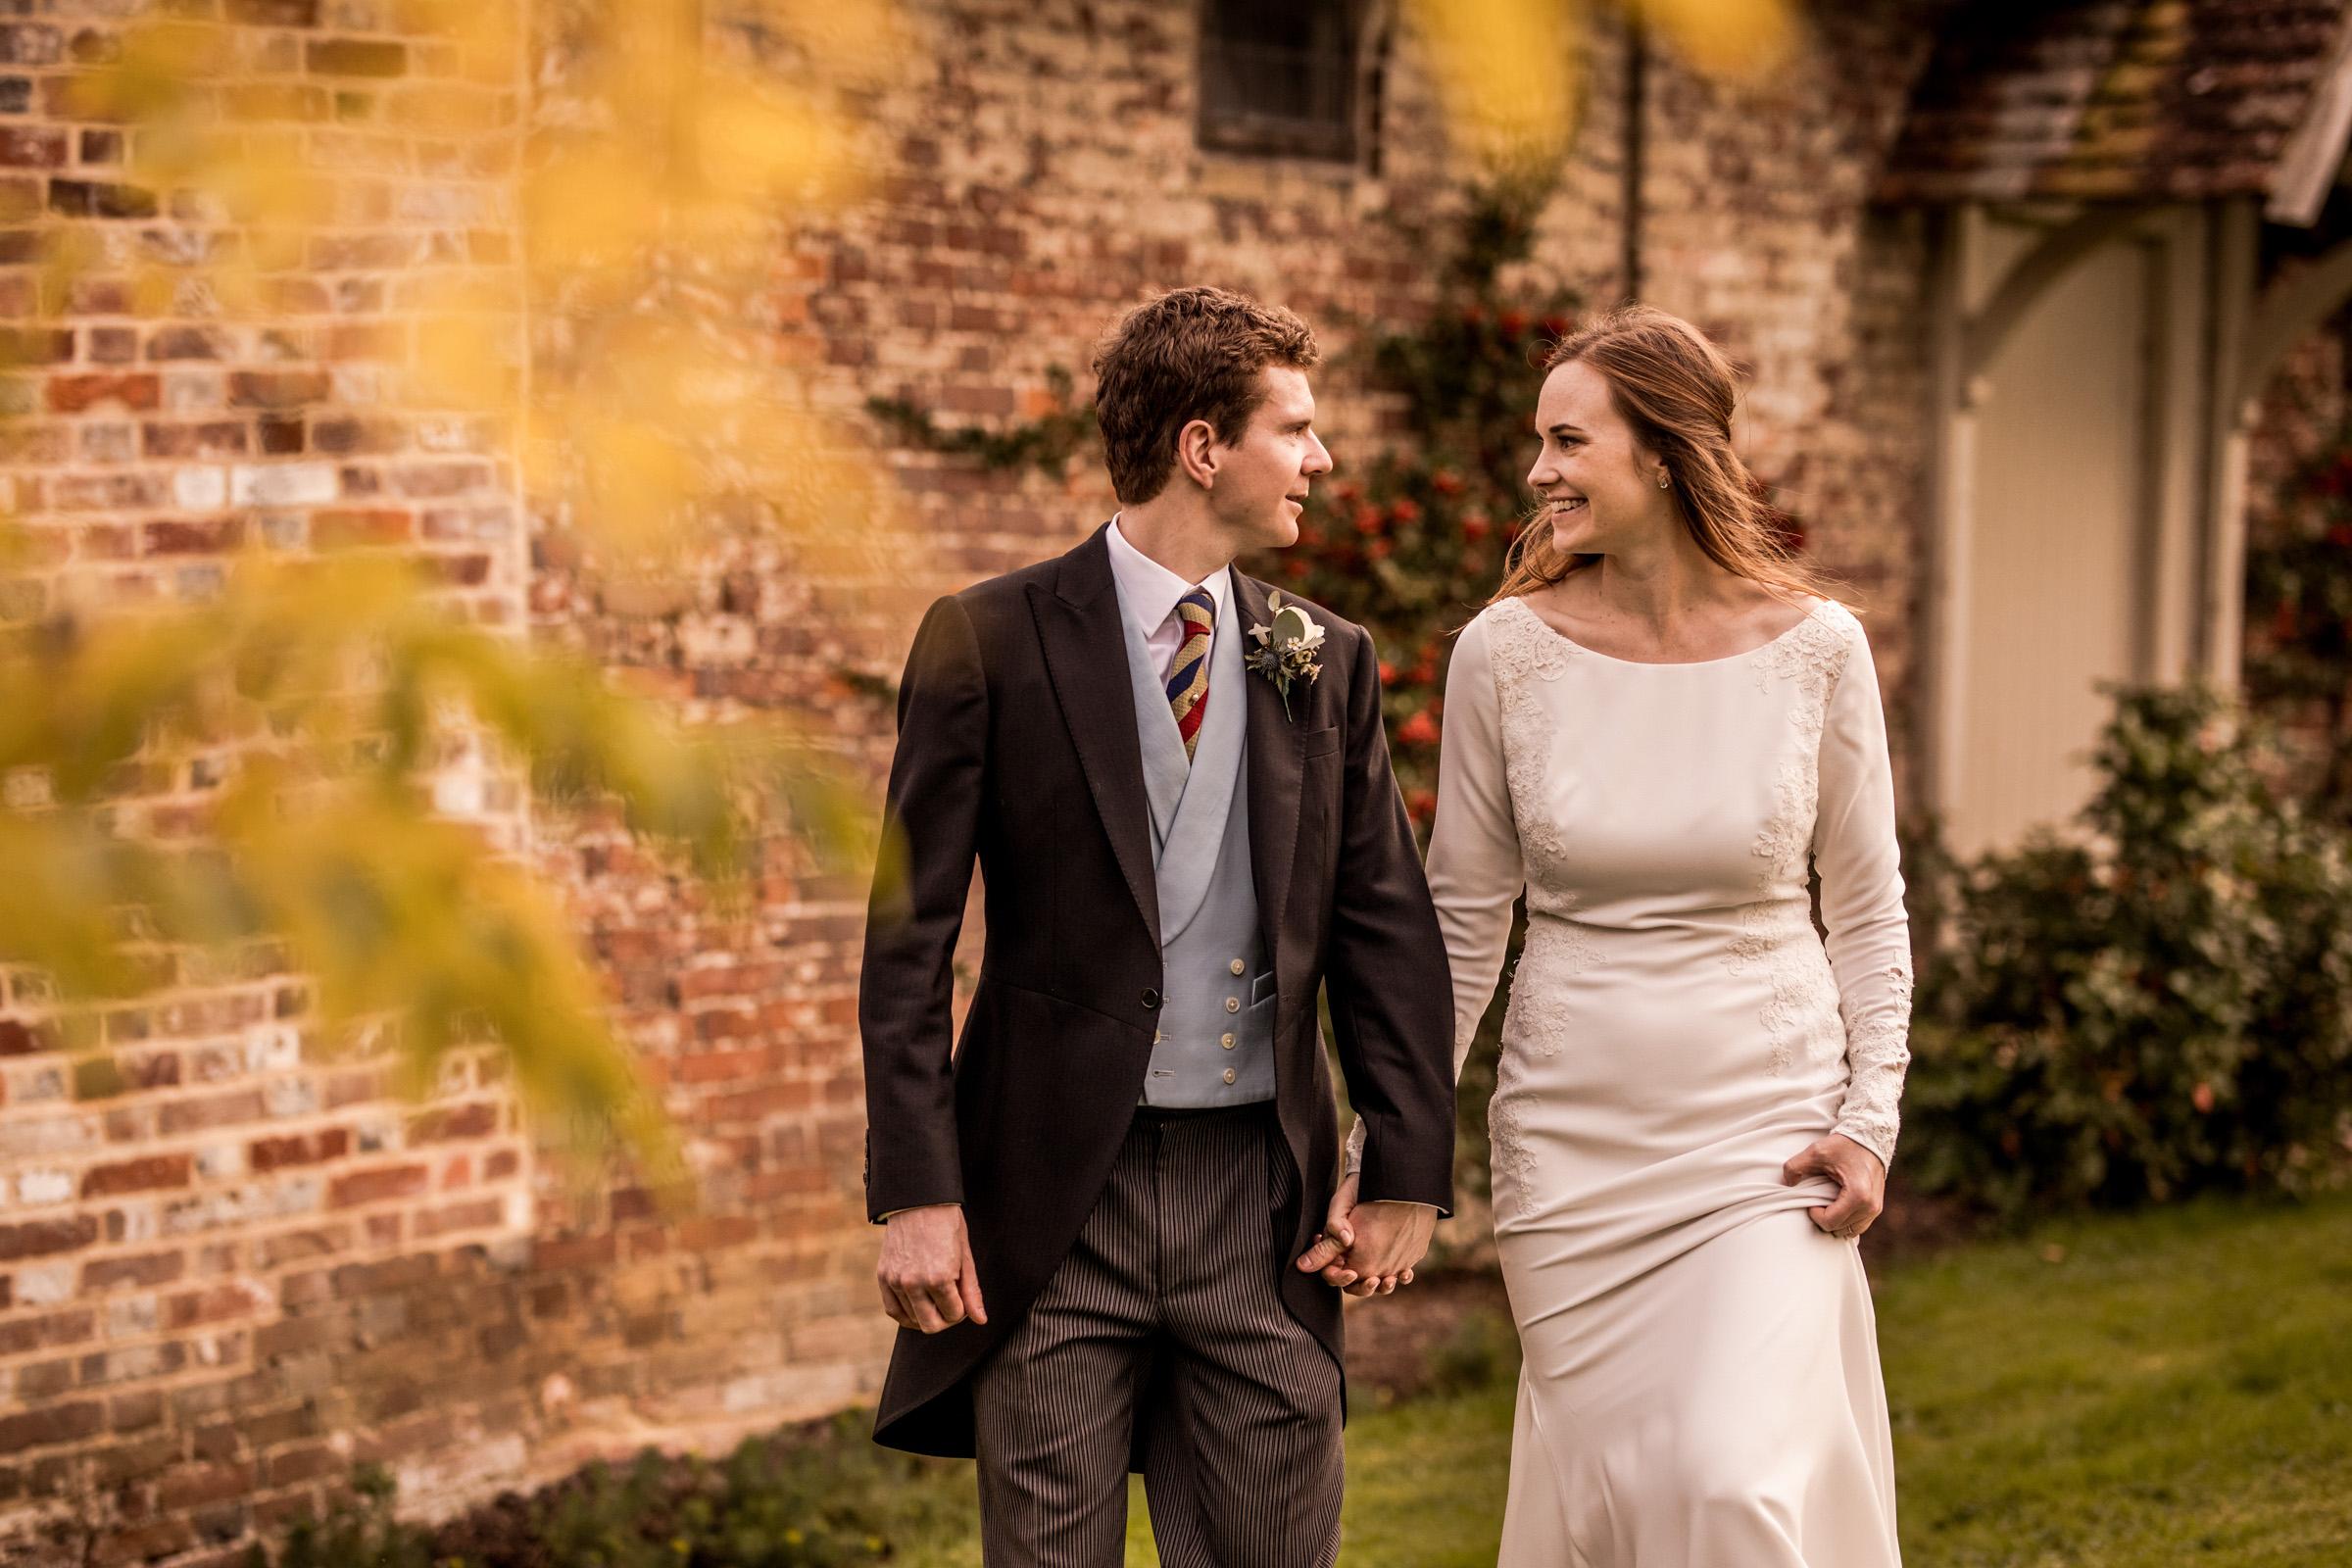 Wedding Photography in Penshurst Kent 014.jpg